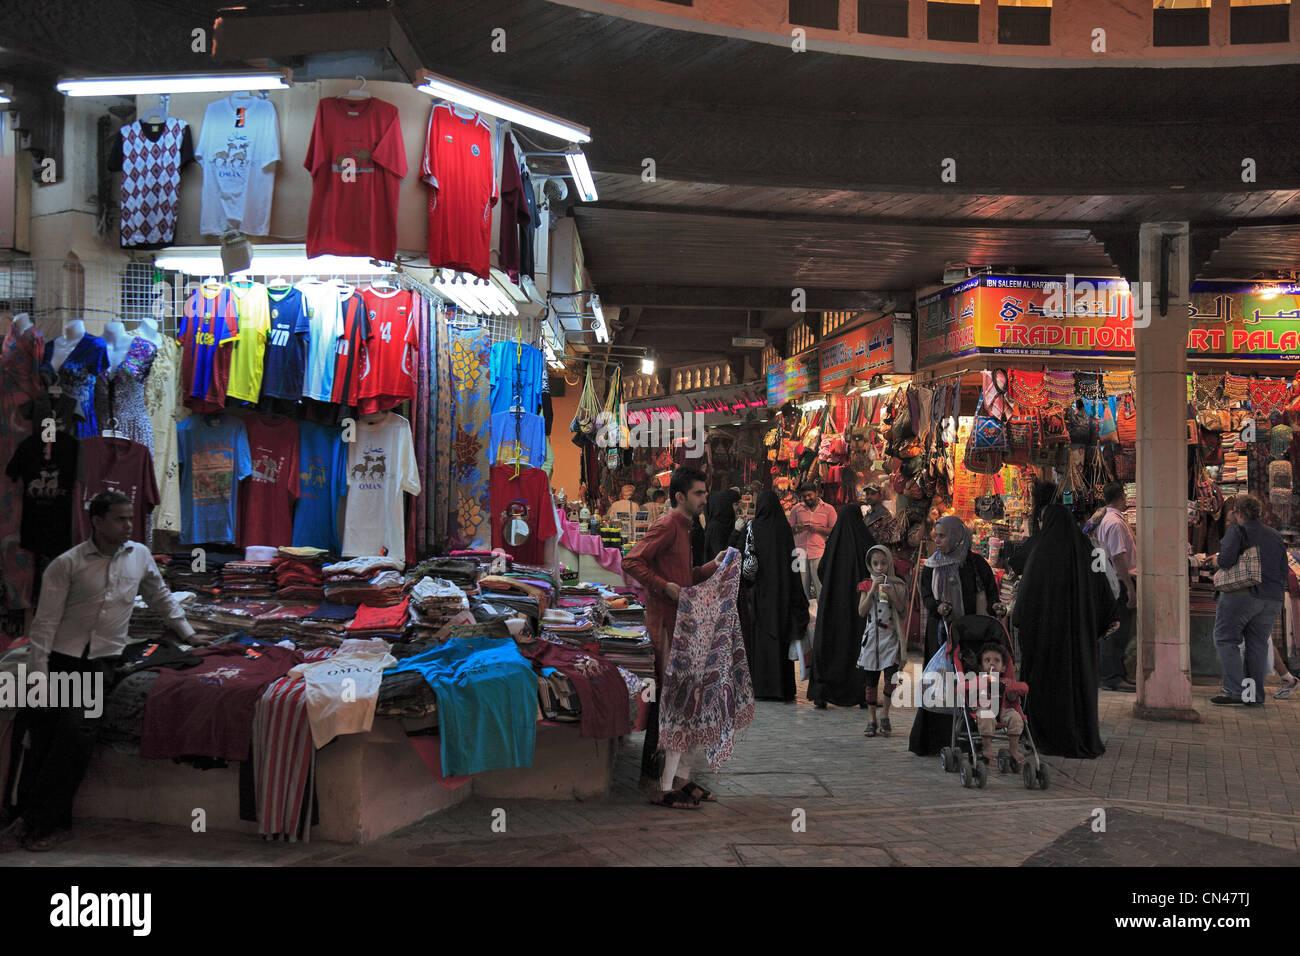 Händler im Mutrah-Souk, Muscat, Oman - Stock Image